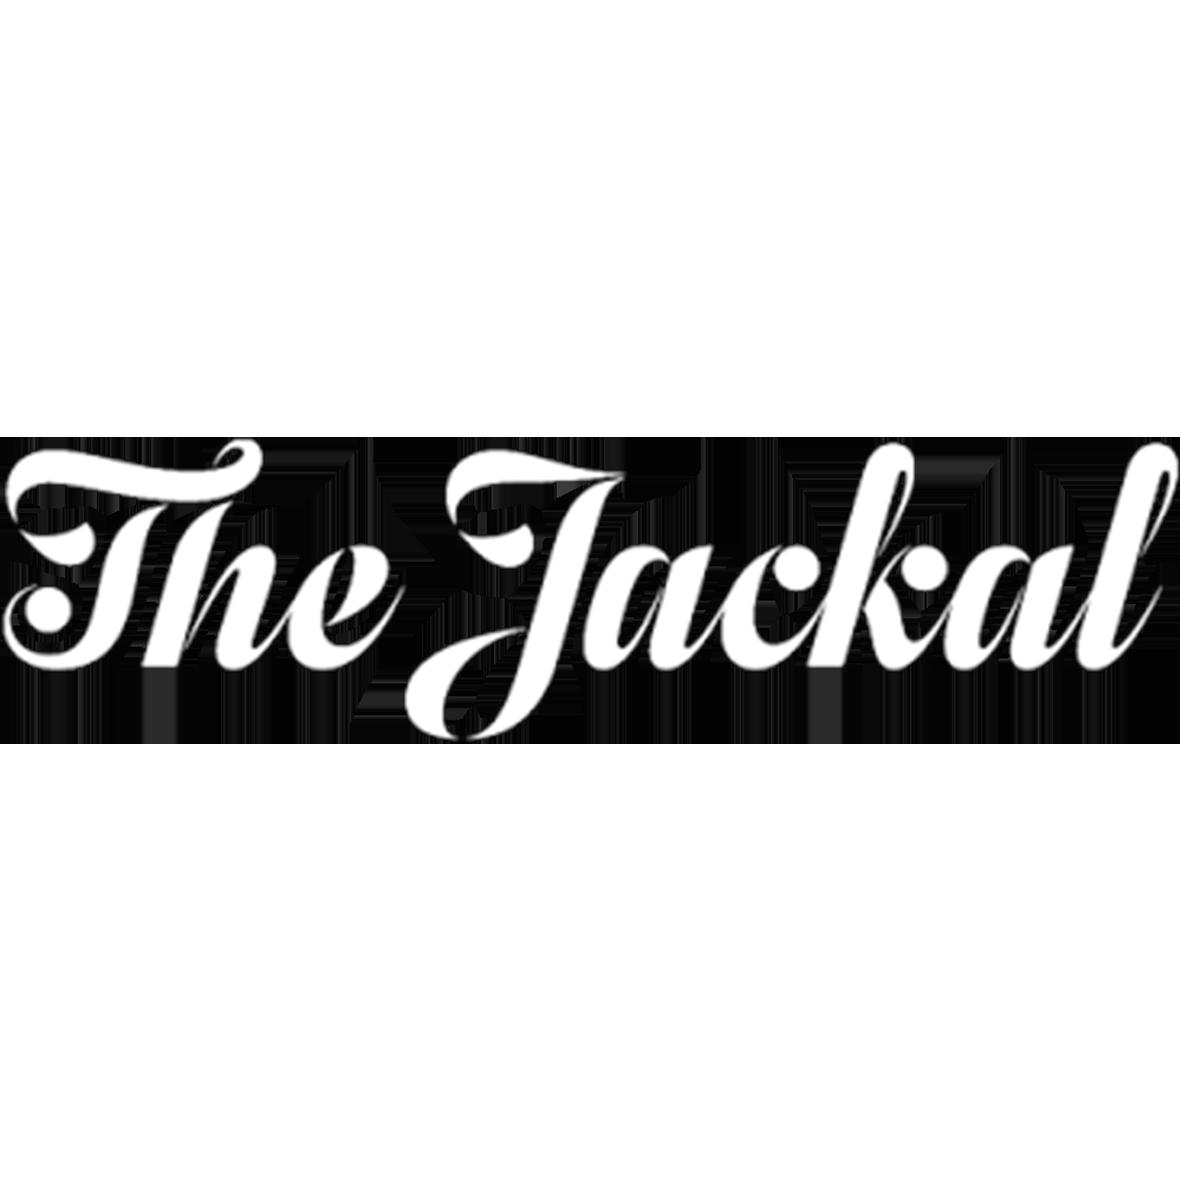 https://kindred.sirv.com/WP_www.wearekindred.com/2019/12/The-Jackal.png